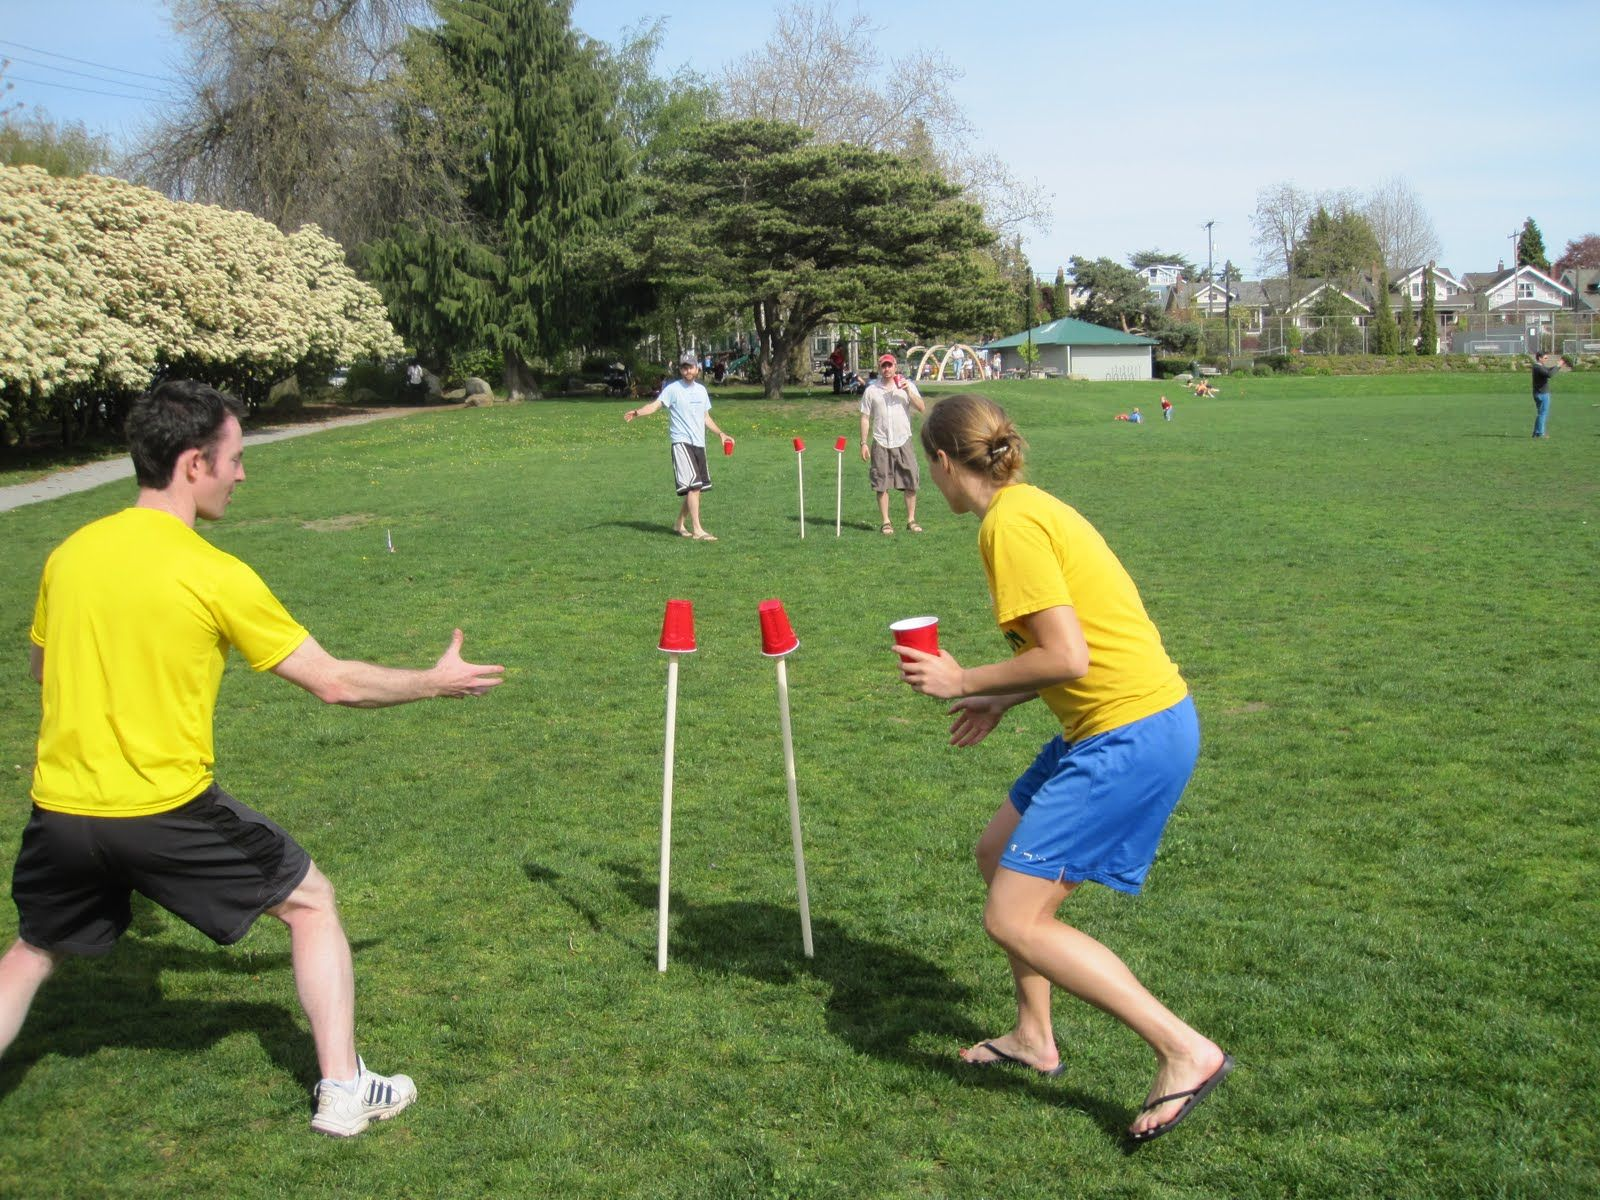 backyard games activities pinterest backyard games games and